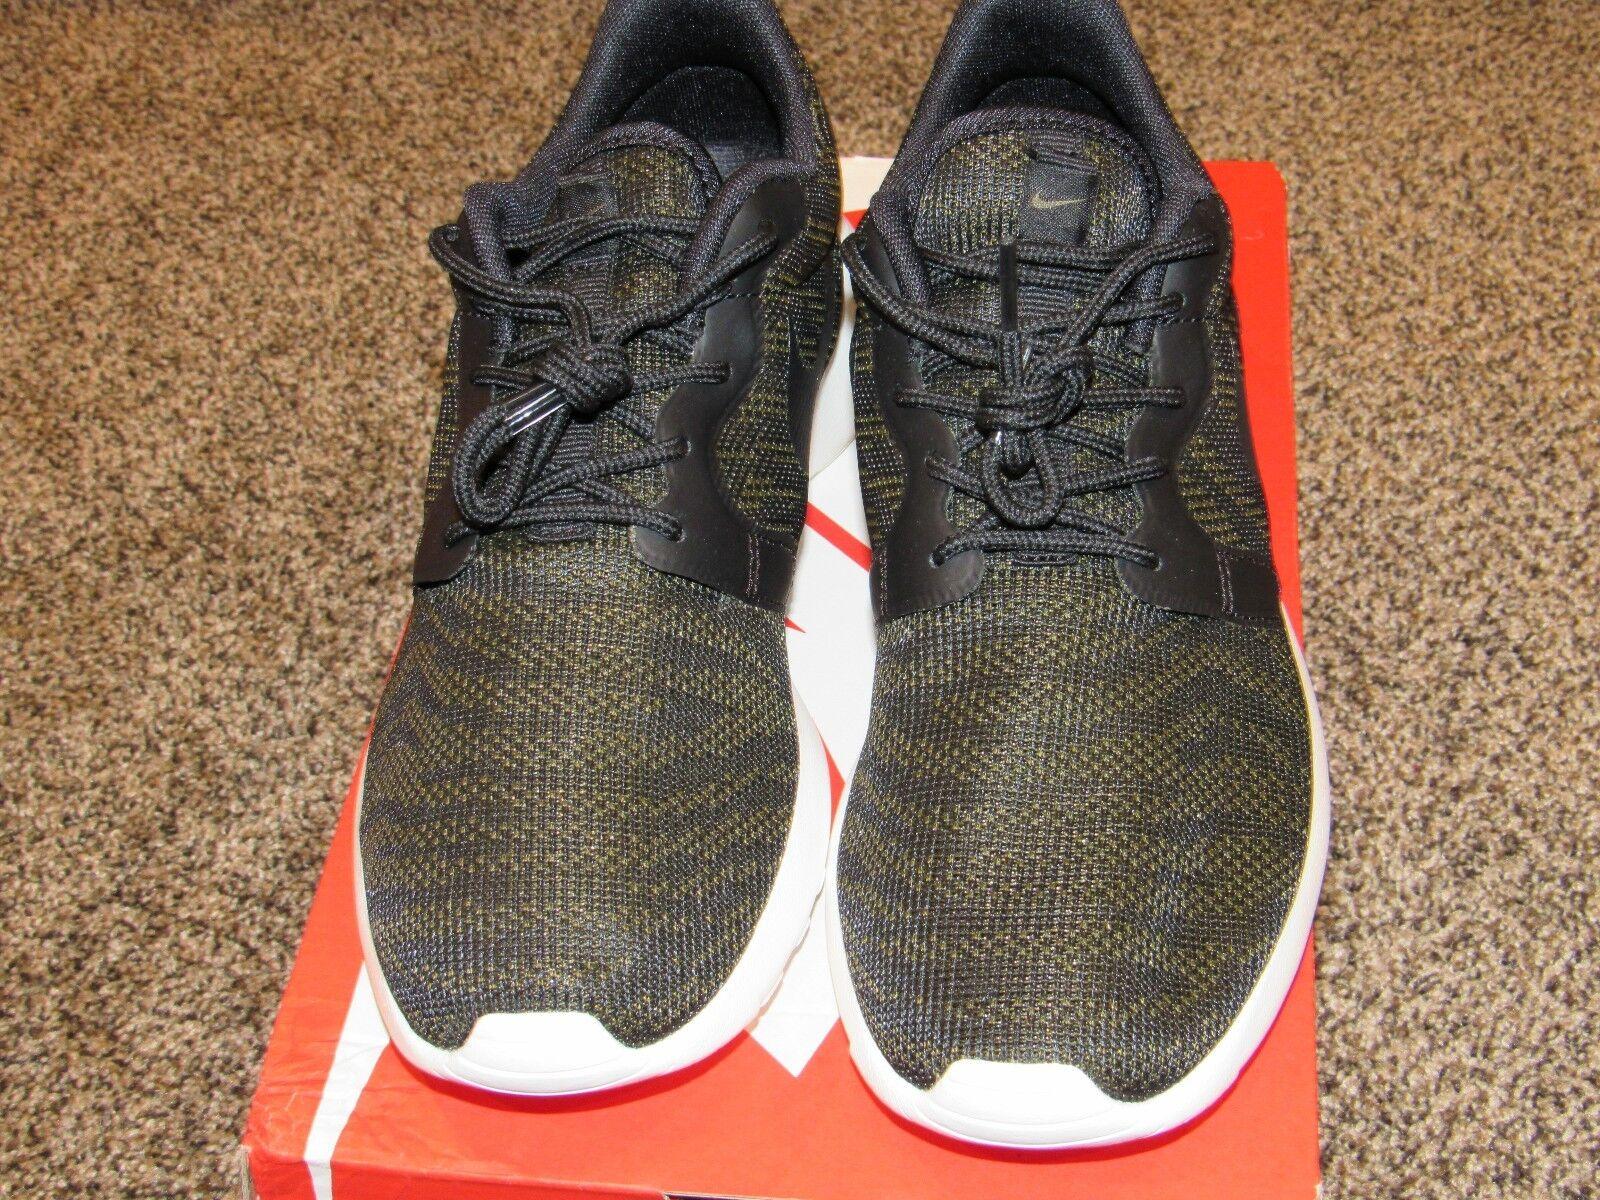 Nike da donna rosherun kjcrd formazione scarpe da corsa, scarpe 705217 300 roshe